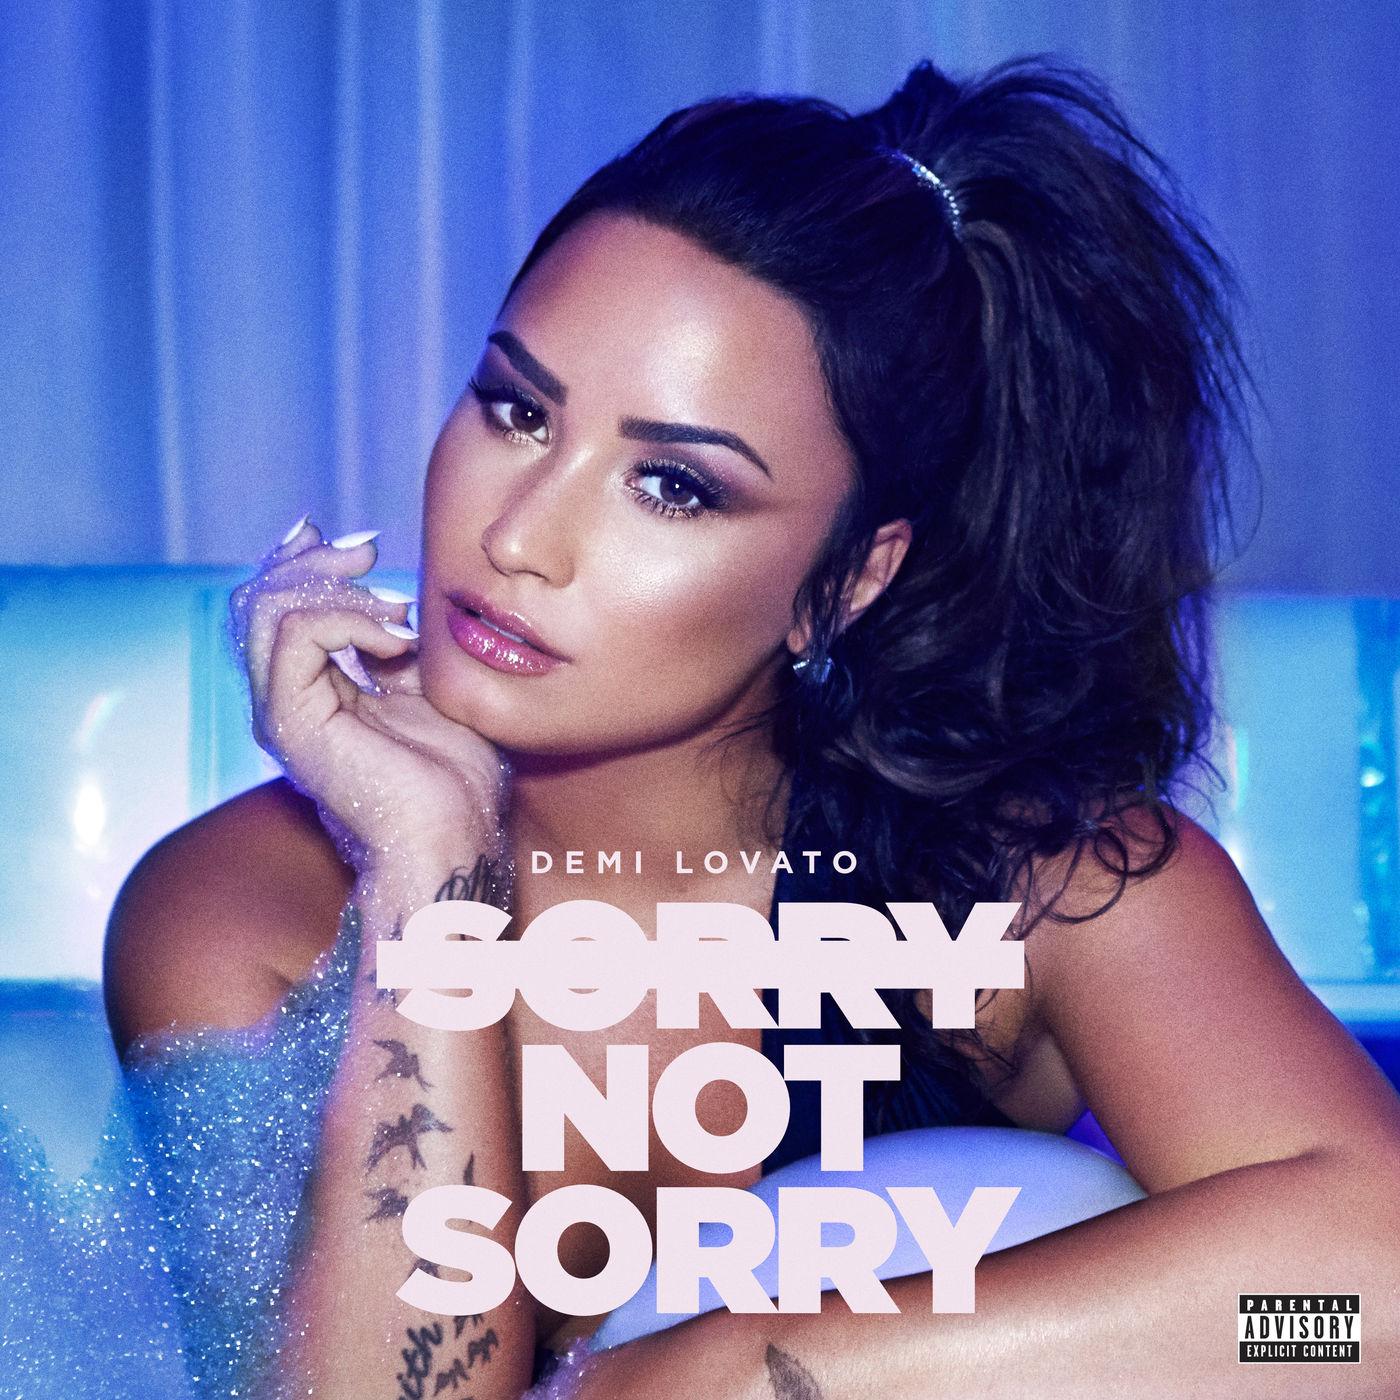 Demi Lovato Sorry Not Sorry